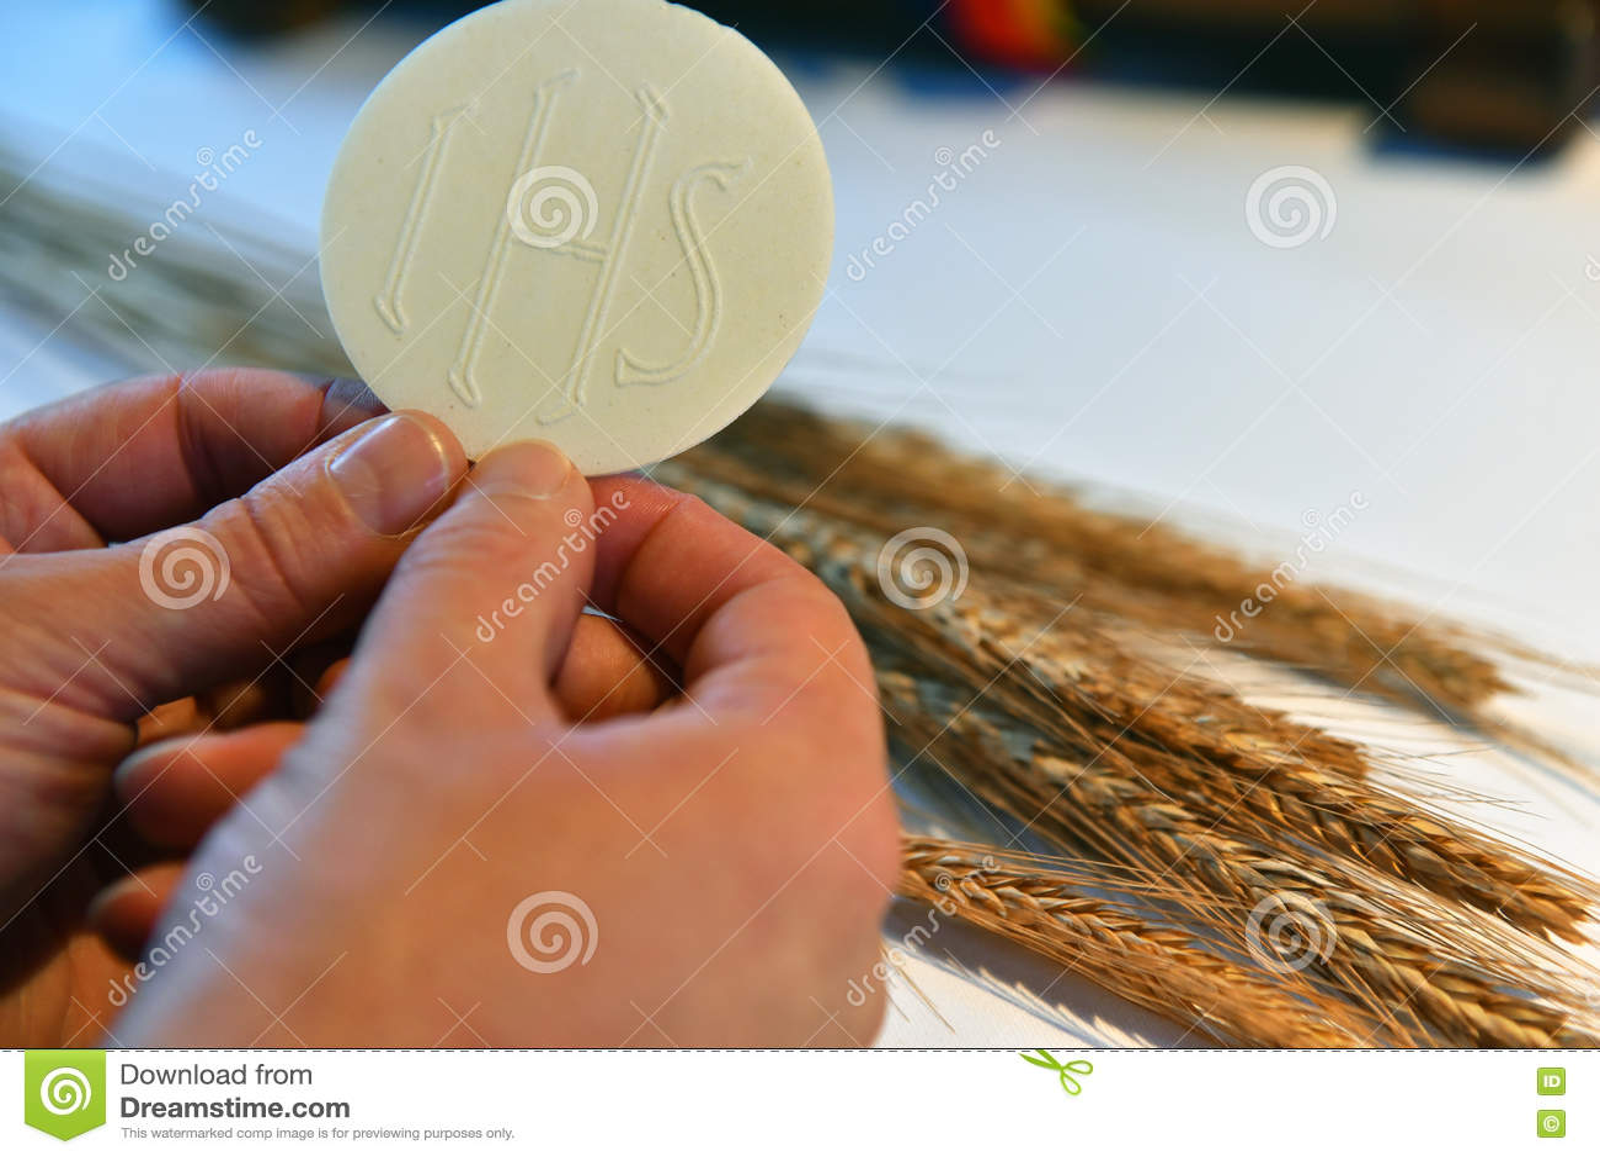 Sacramental bread and wheat.